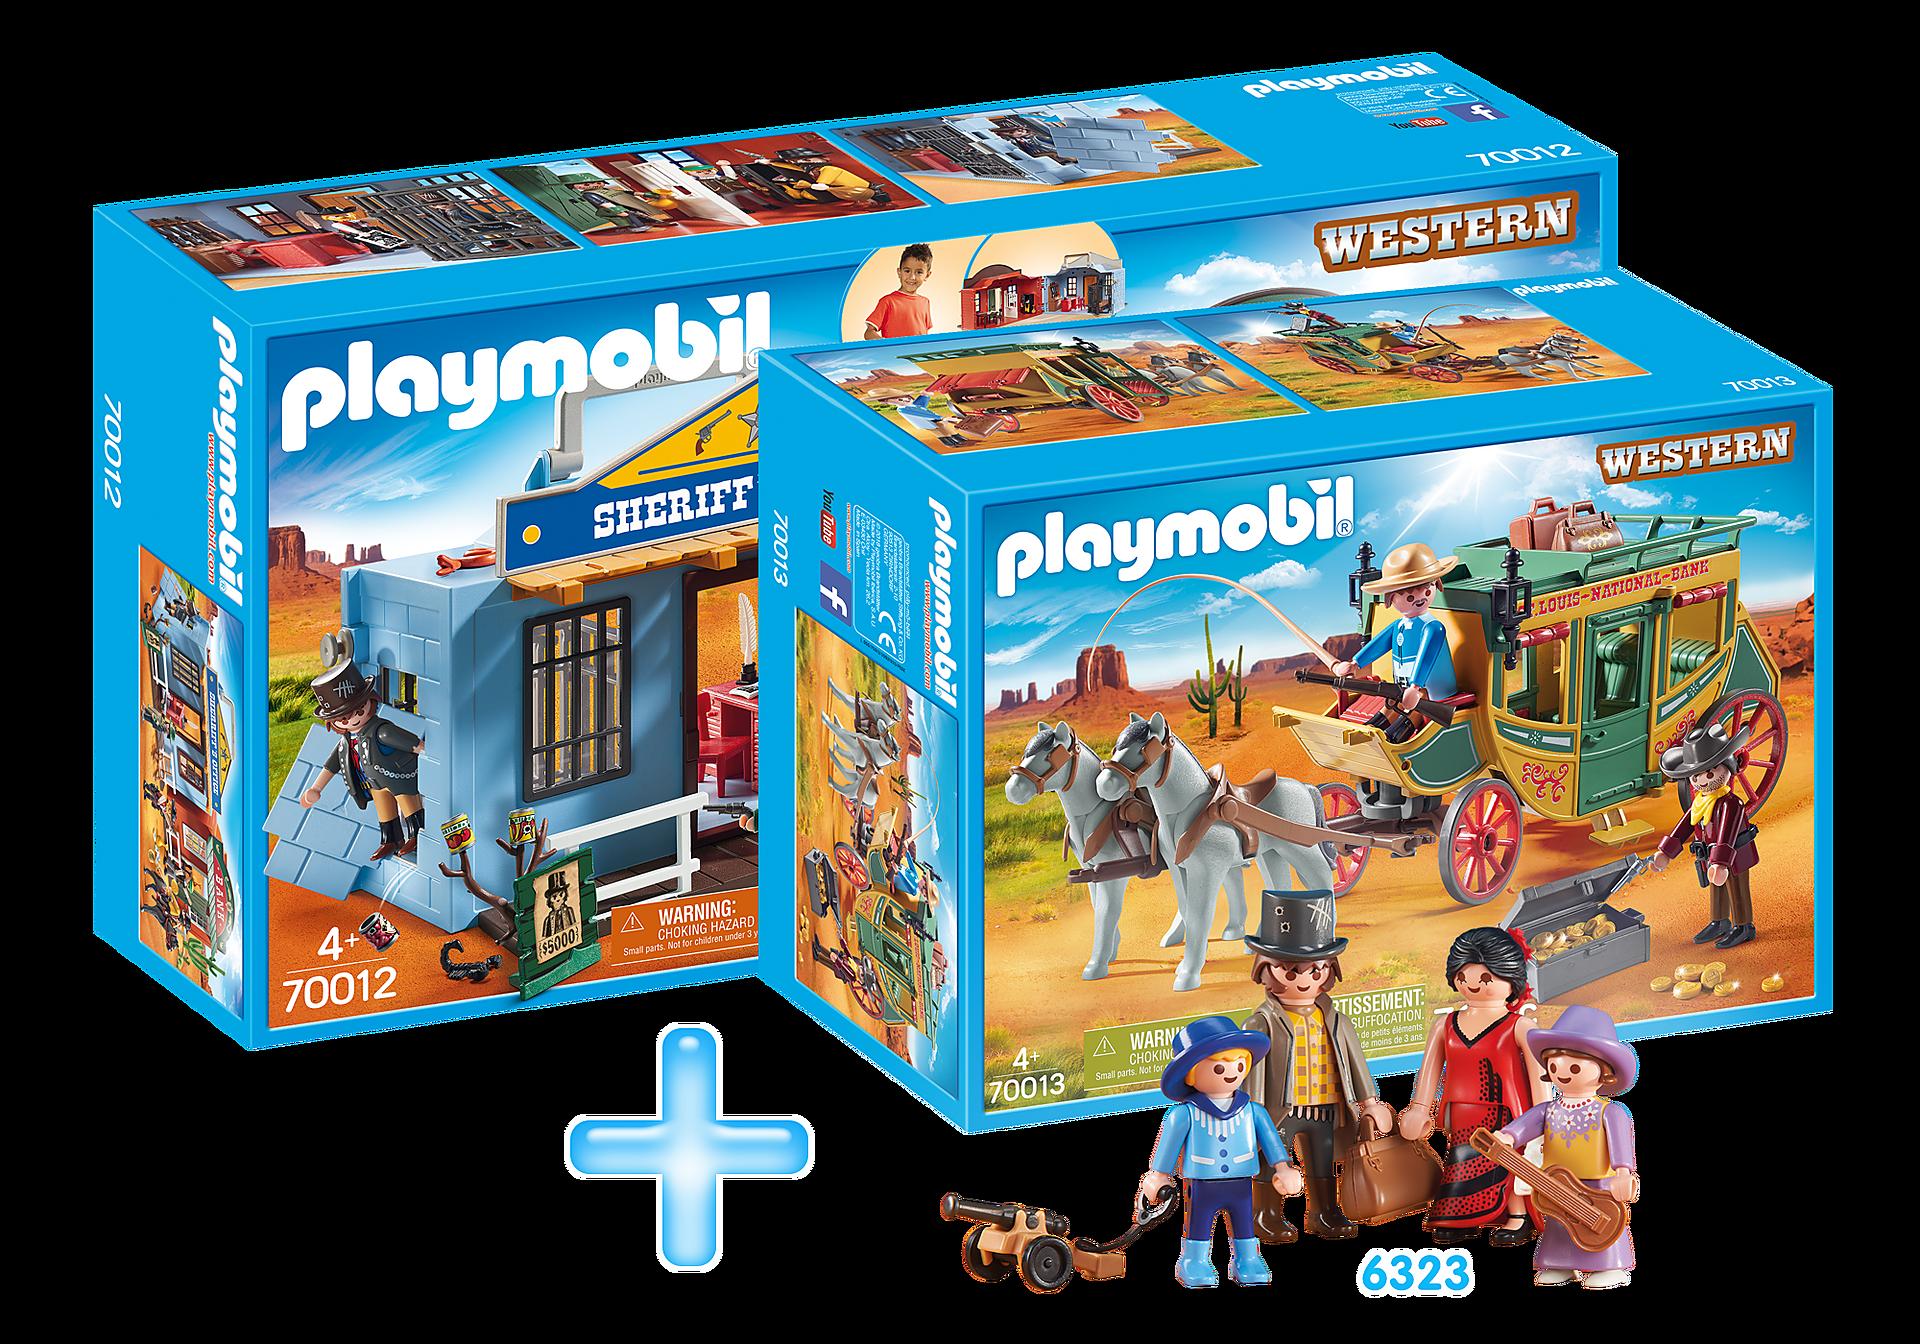 http://media.playmobil.com/i/playmobil/PM1910E_product_detail/Western Bundle